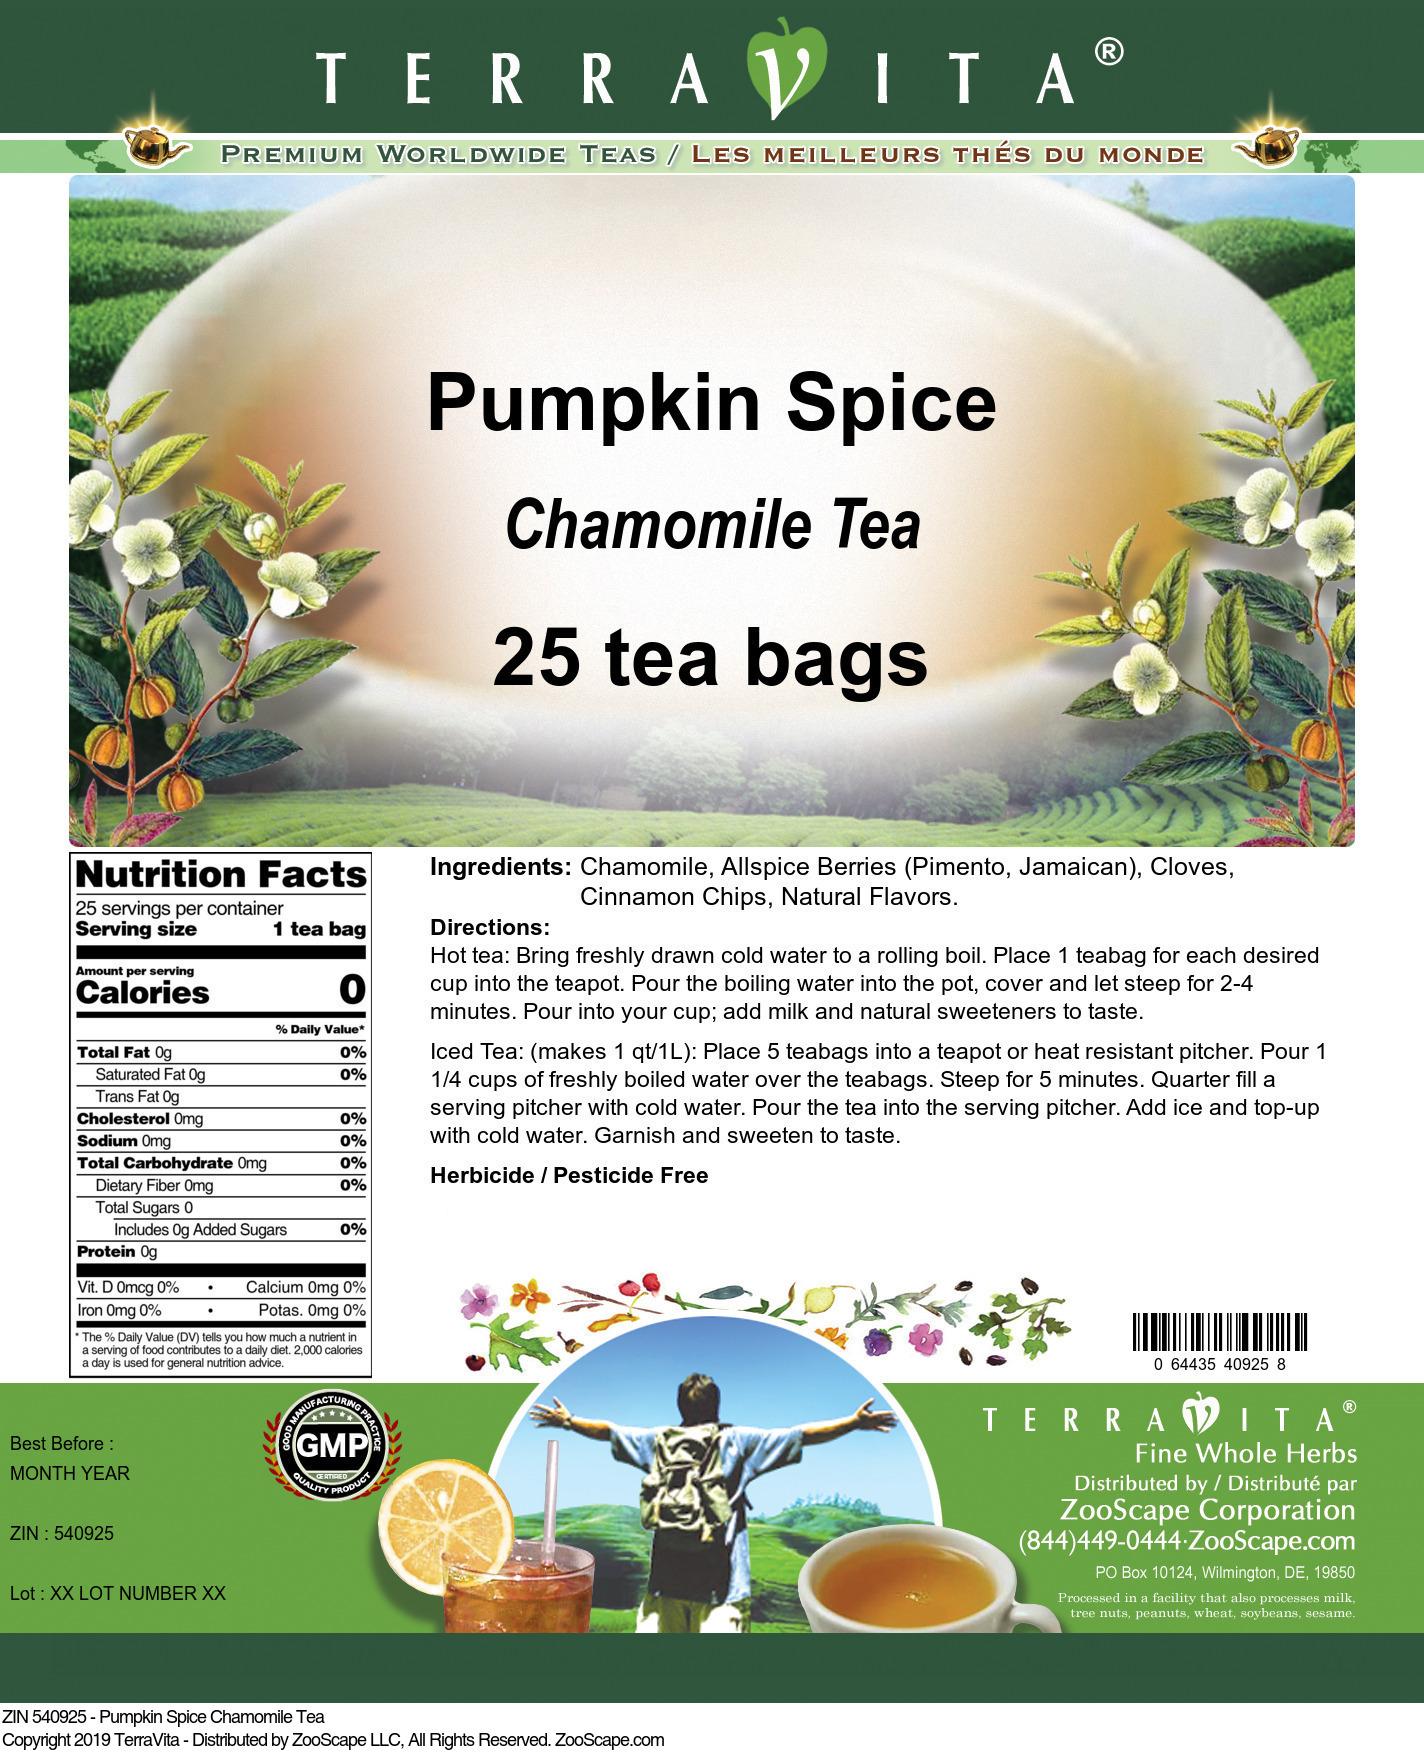 Pumpkin Spice Chamomile Tea